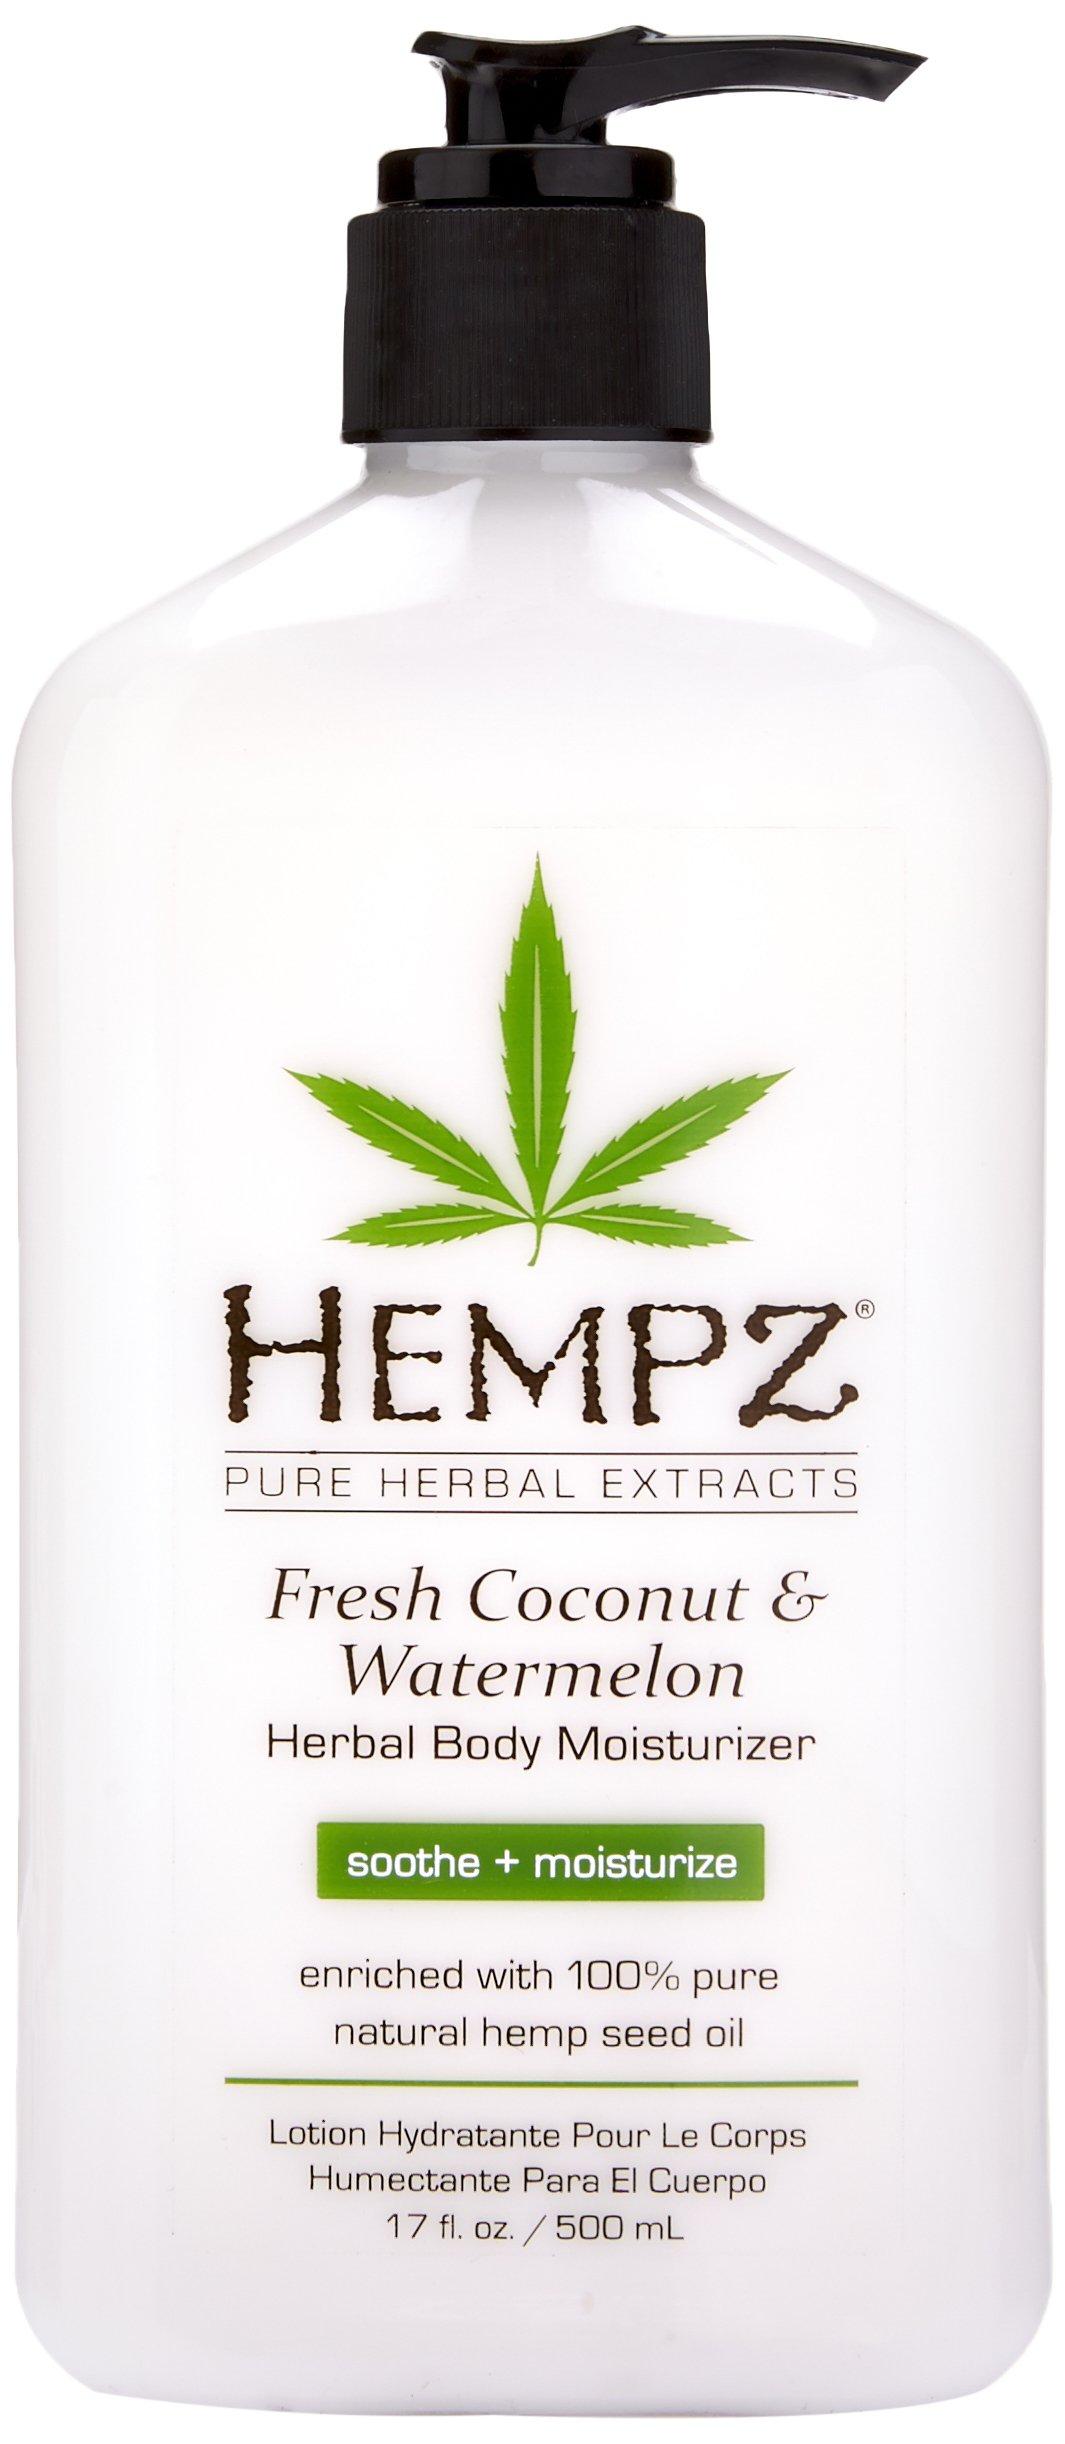 Hempz Natural Herbal Body Moisturizer: Fresh Coconut & Watermelon Moisturizing Skin Lotion, 17 oz